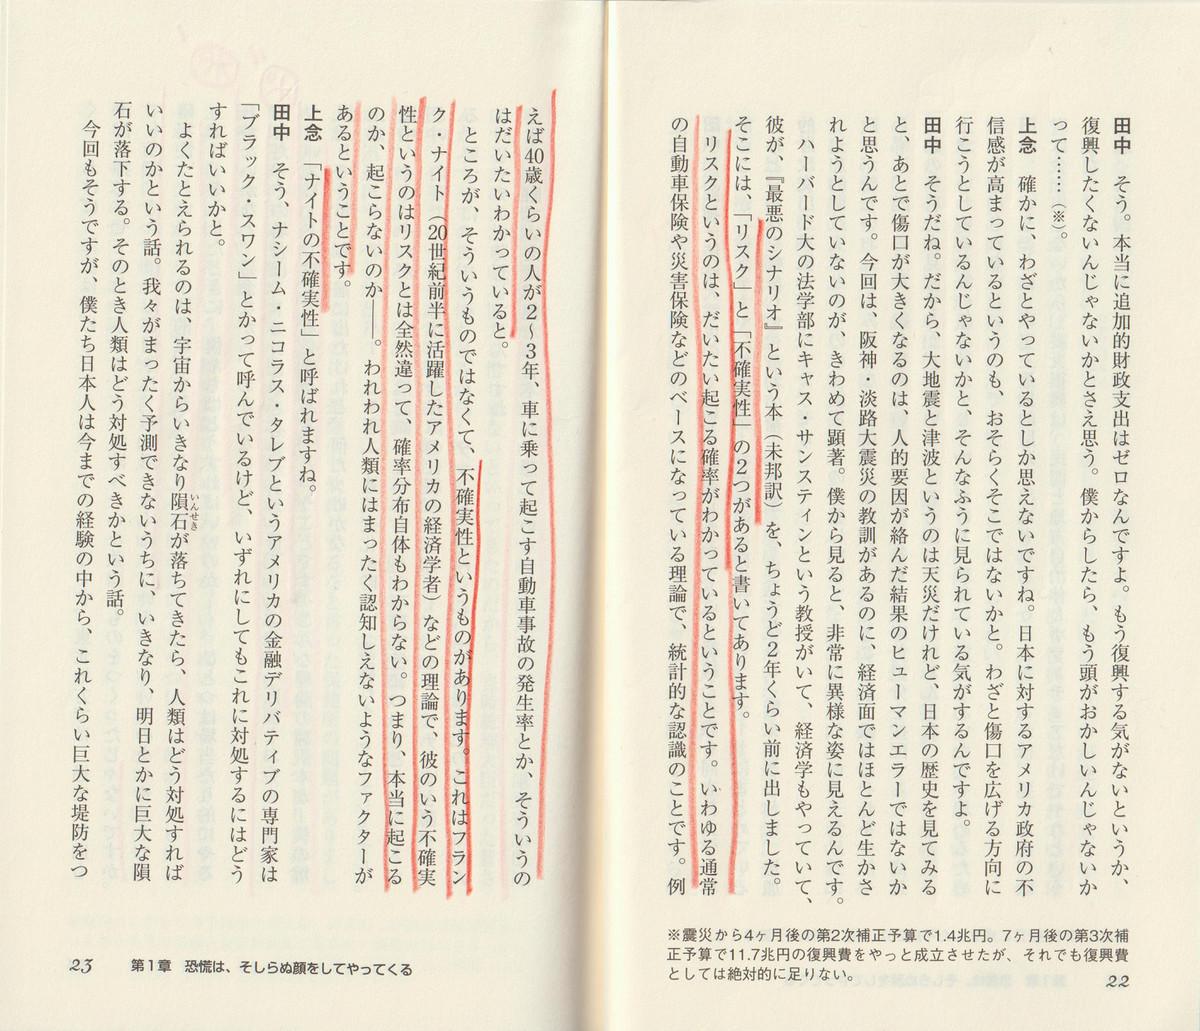 f:id:tanakahidetomi:20200501025629j:plain